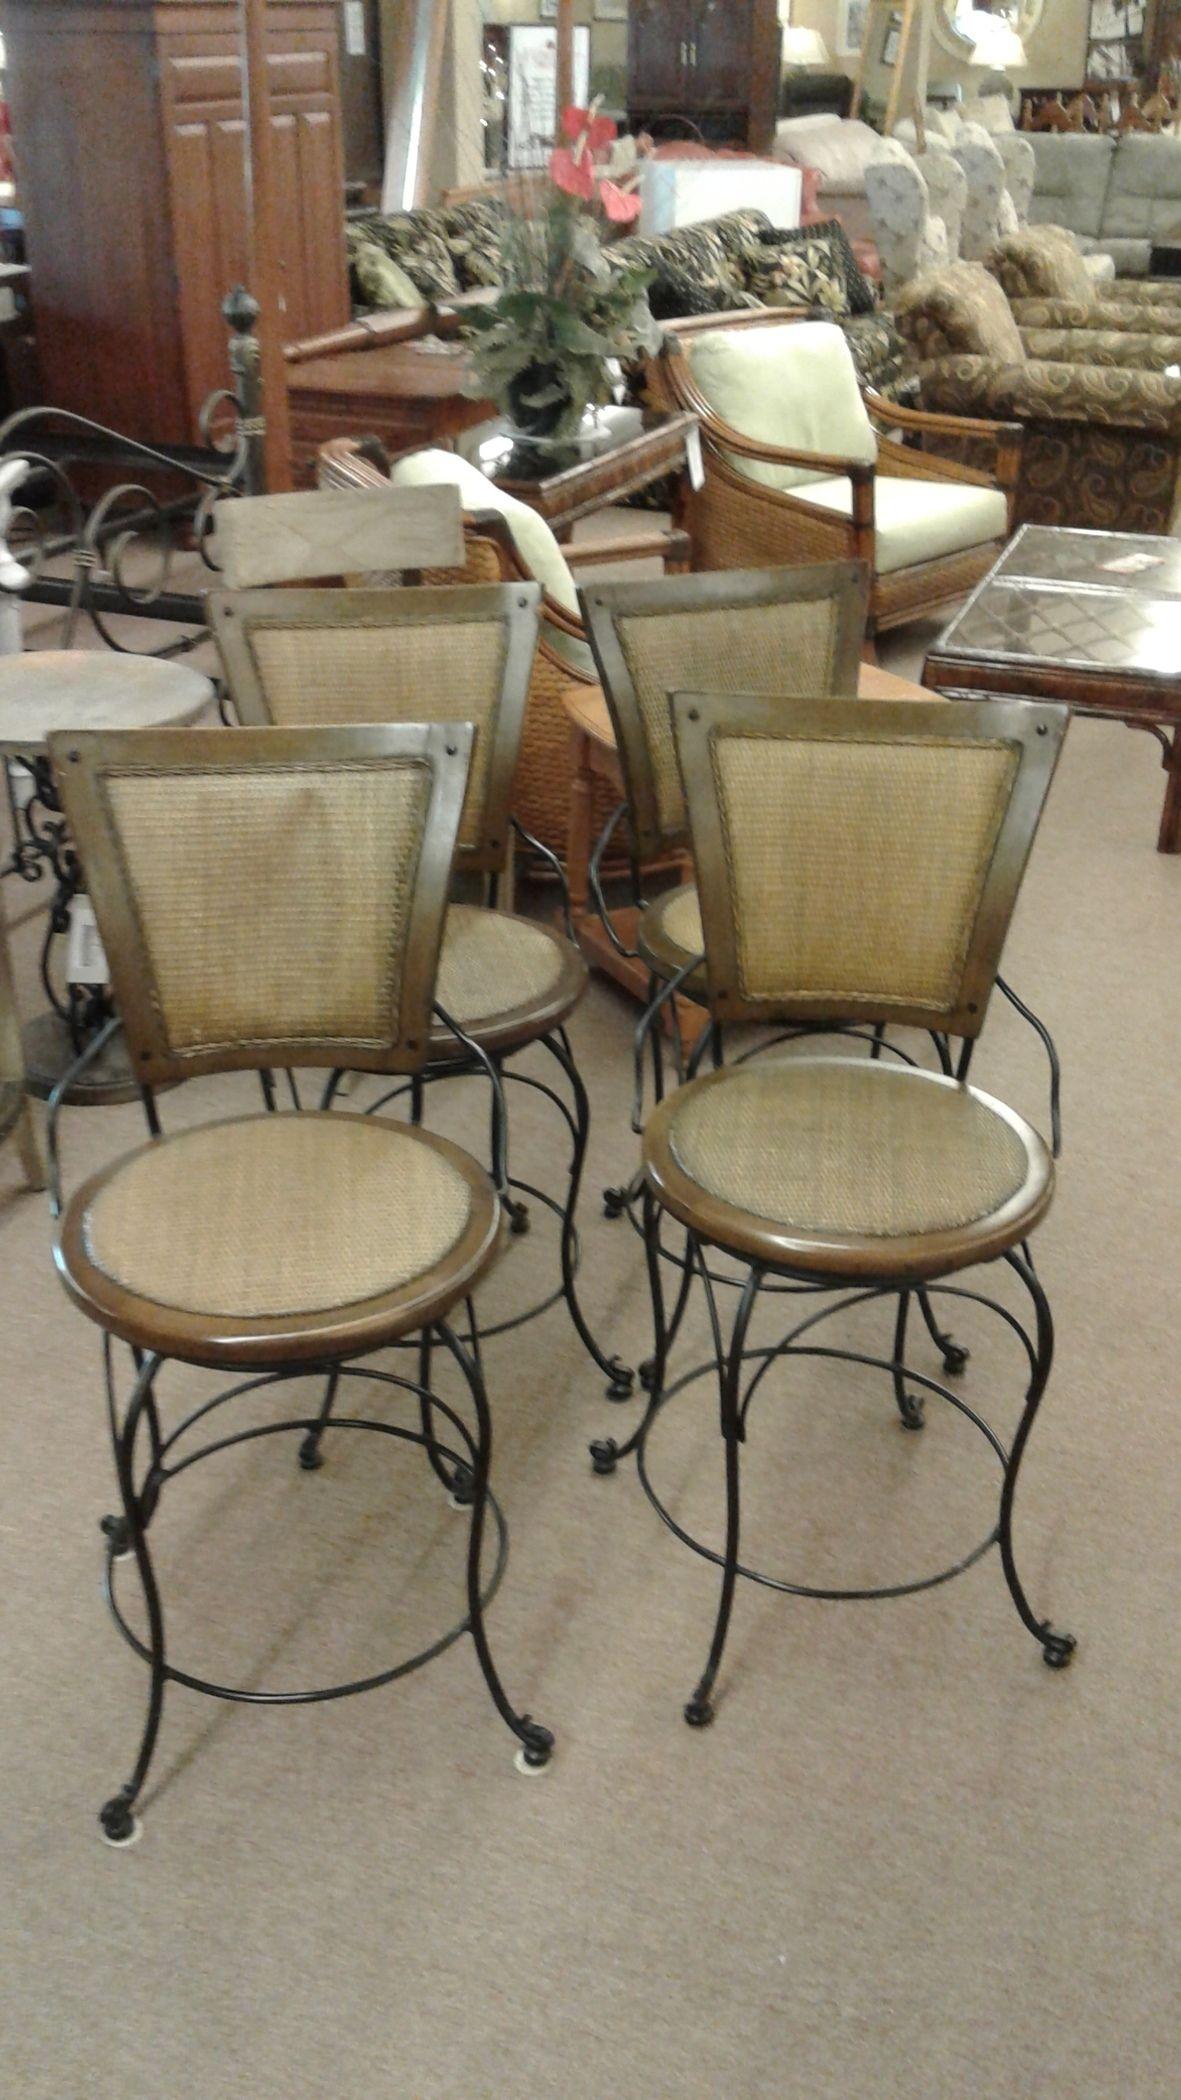 4 Barstools W Backs Delmarva Furniture Consignment